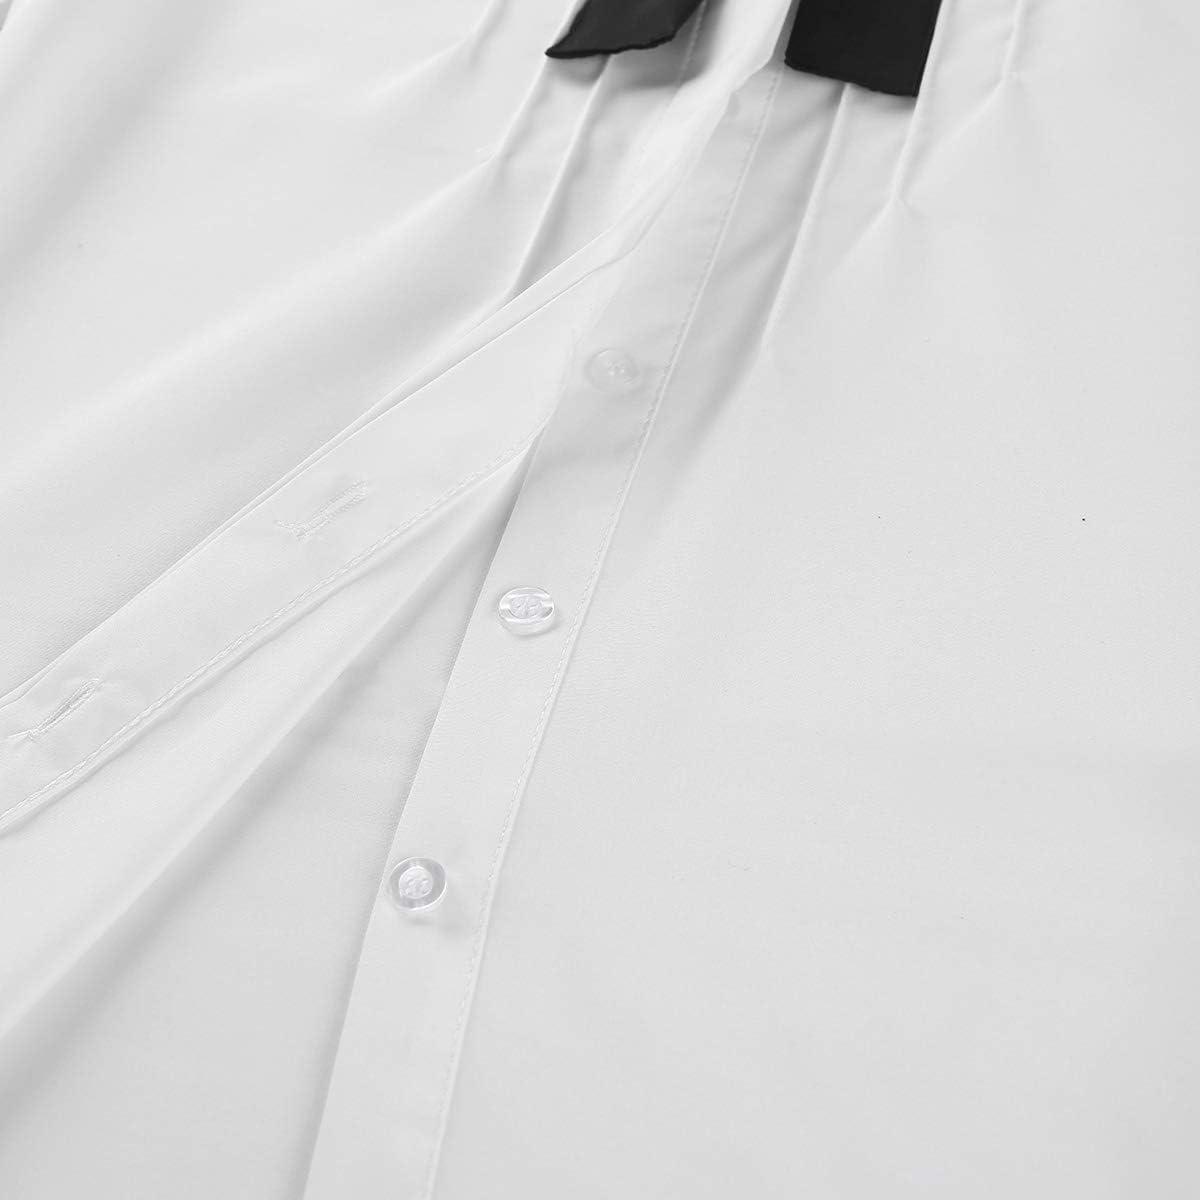 inlzdz Mujer Blusa para Primavera Otoño Camiseta Manga Larga ...